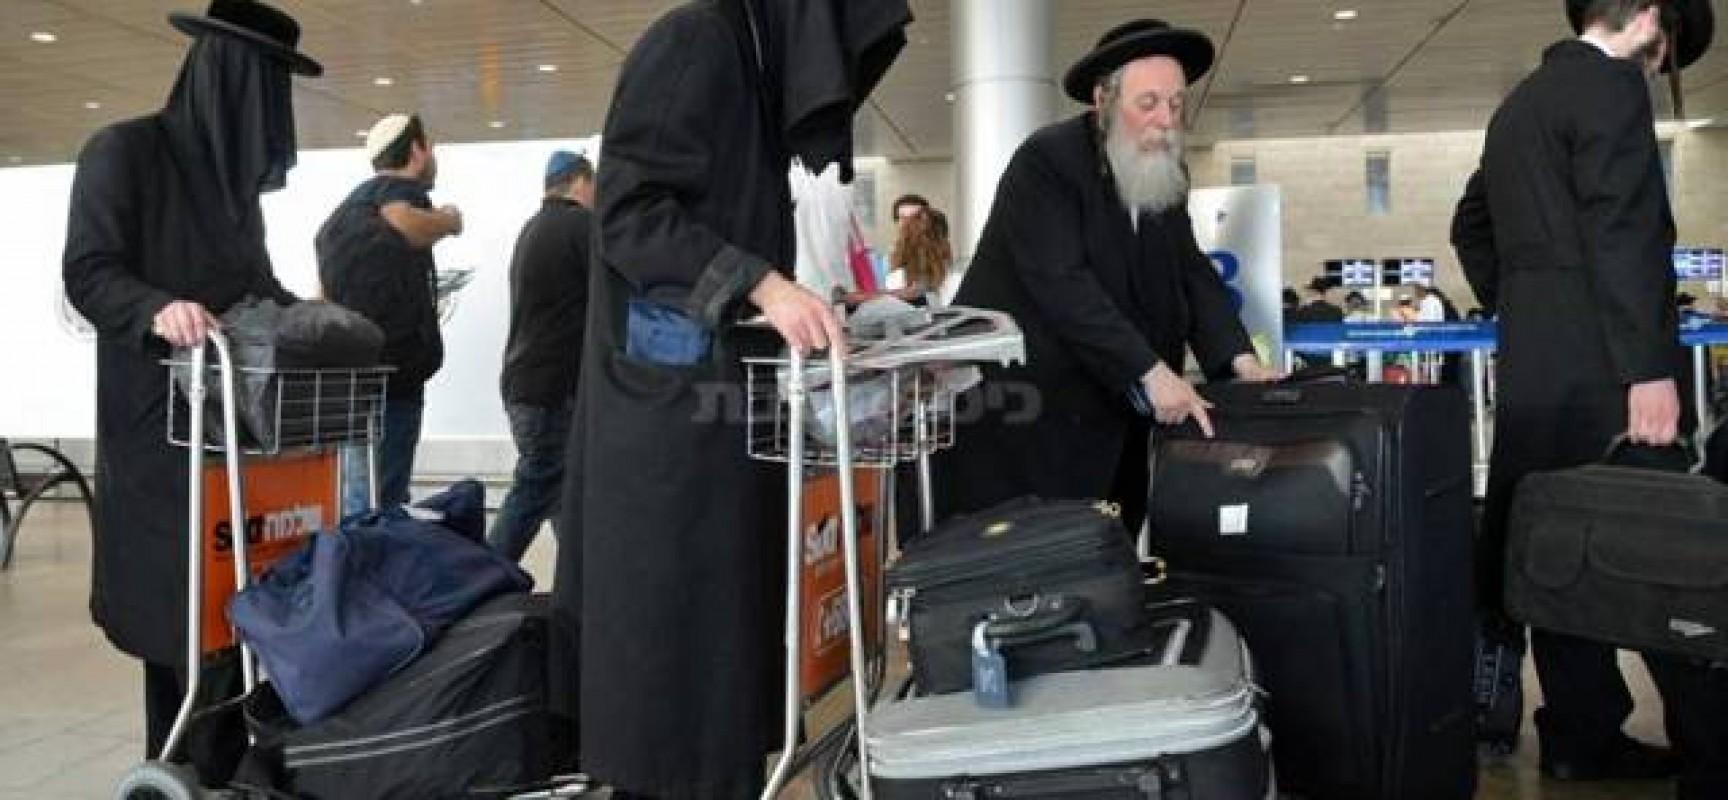 Rama Yade contre le voile - Page 2 Hommes_en_burka_a_l_aeroport_tel_aviv-1728x800_c